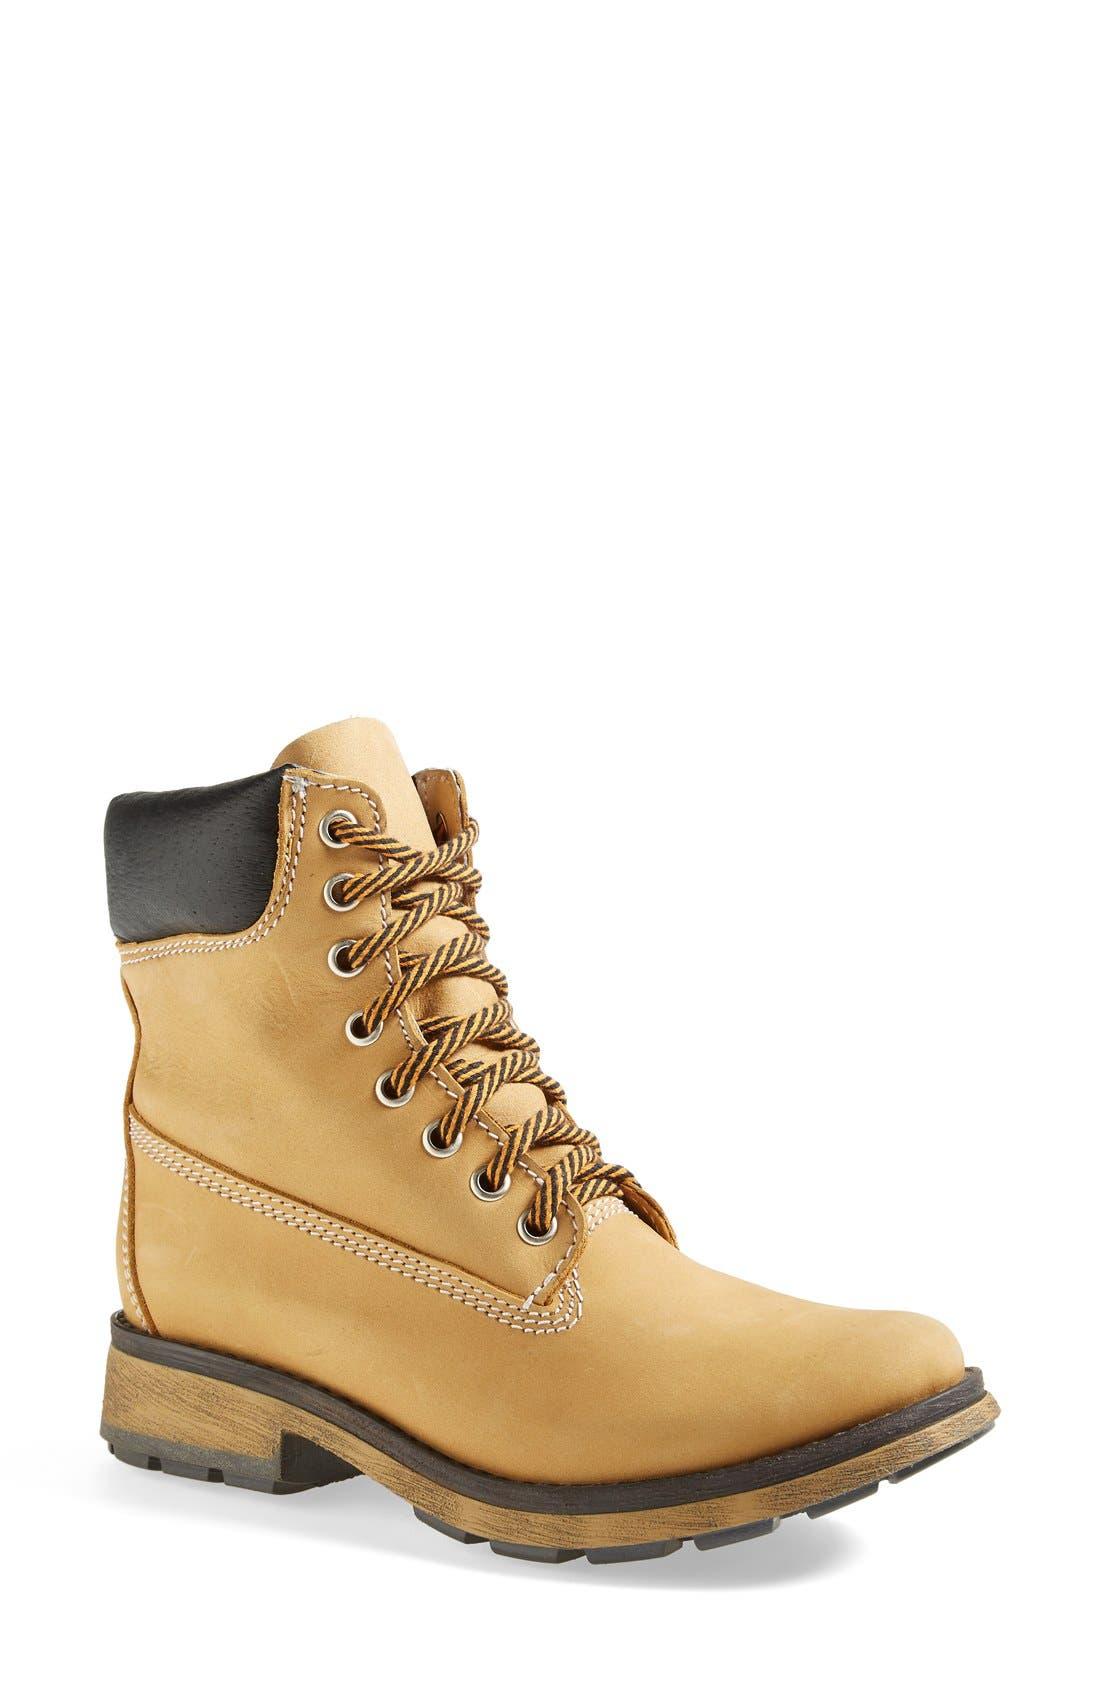 'Pasa' Work Boot, Main, color, 200